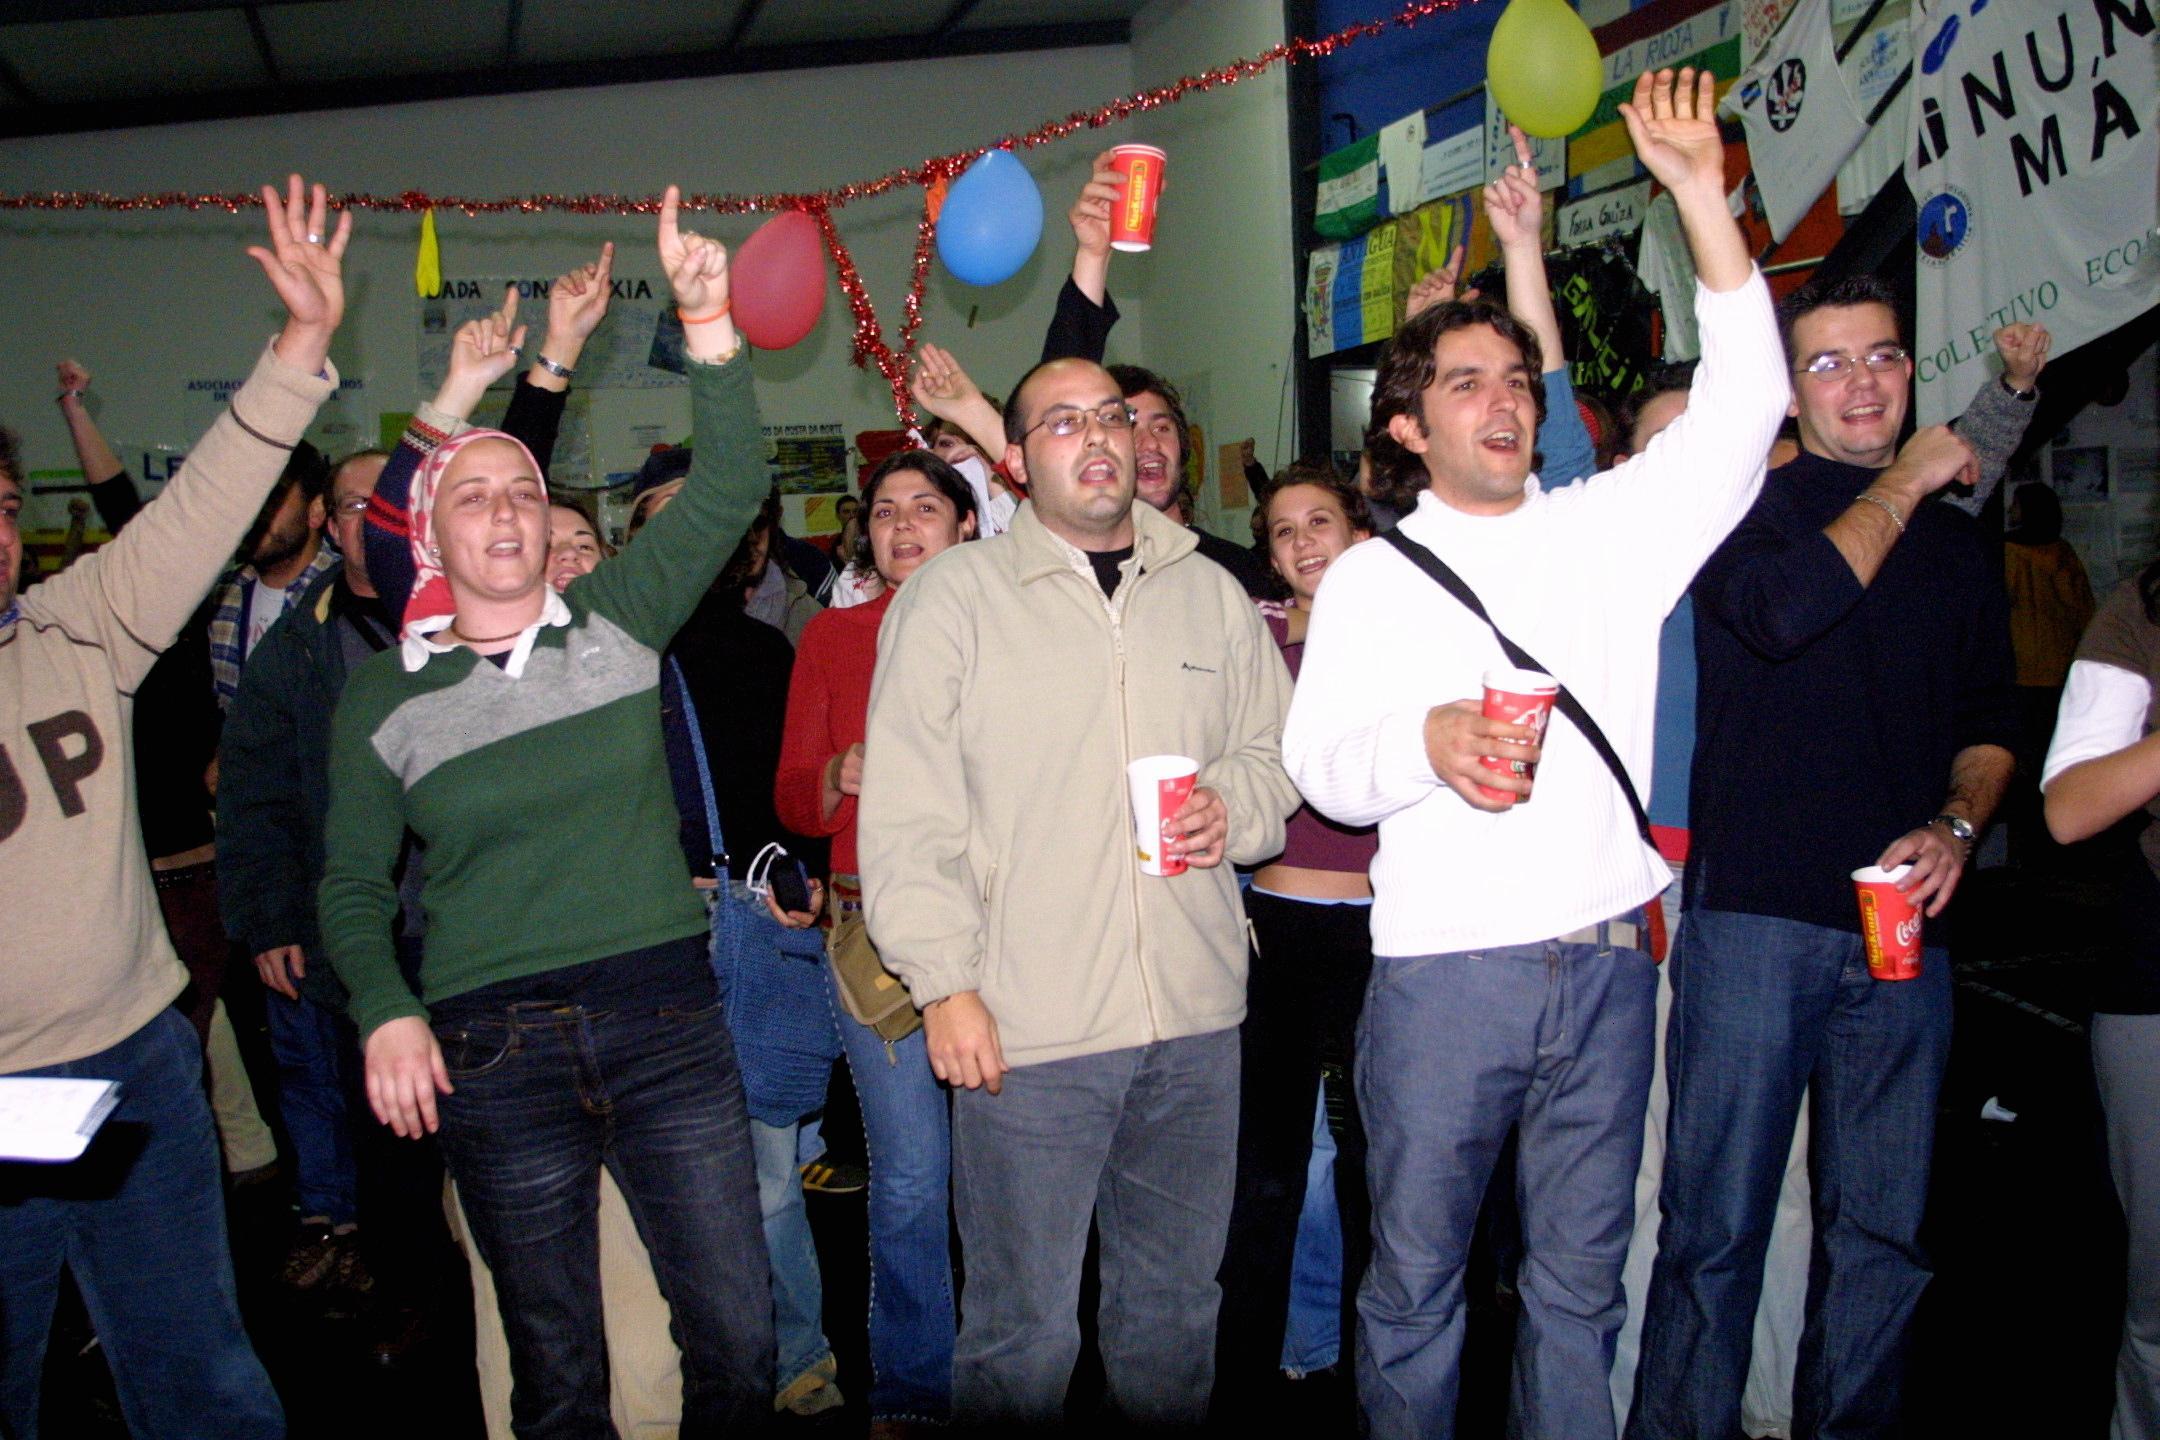 Fiesta en Muxía. <br><b>José Manuel Casal</b>